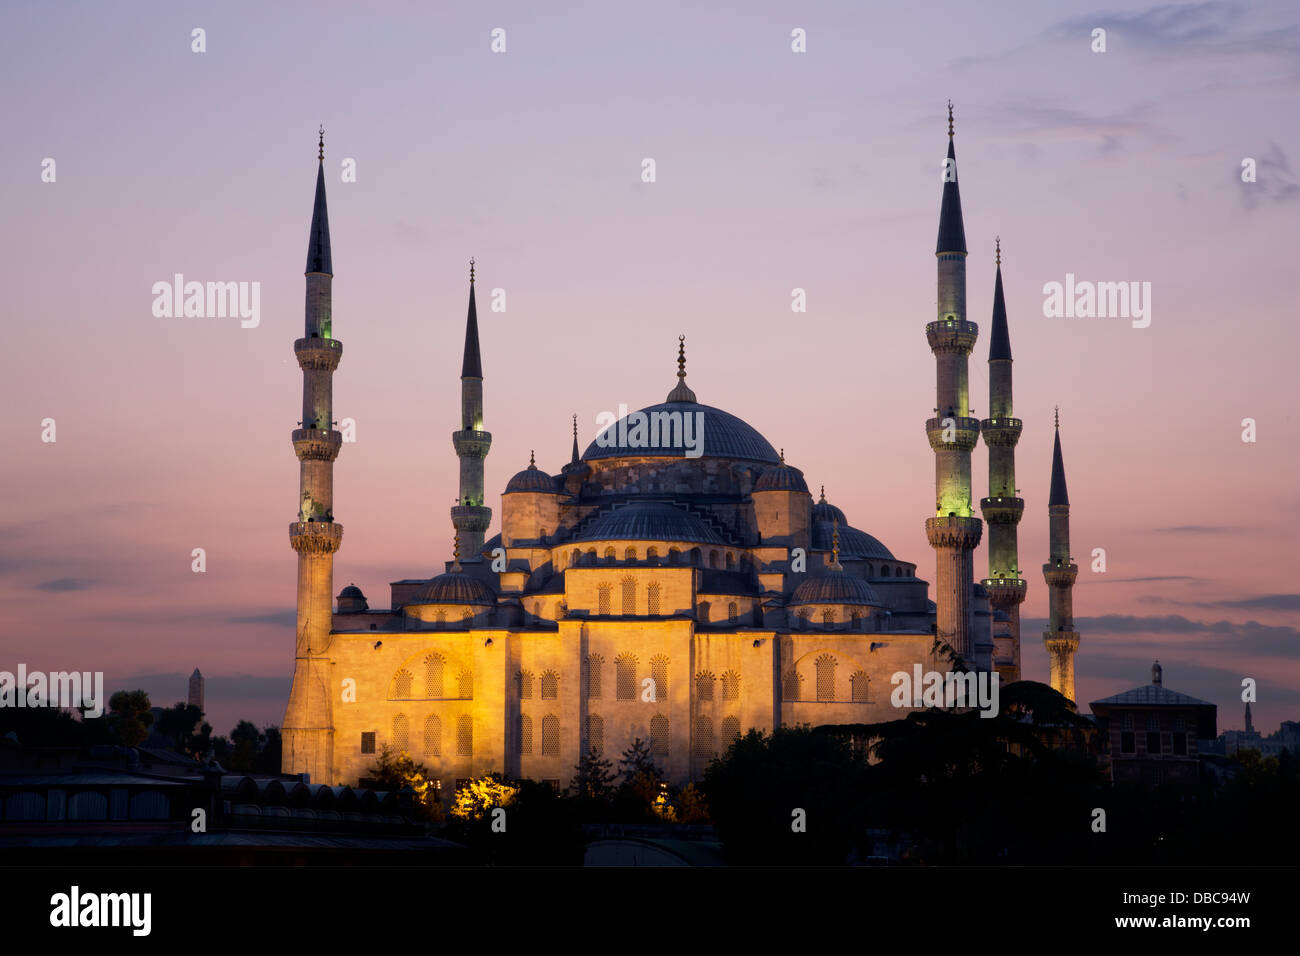 La Mezquita Azul de Estambul al atardecer Imagen De Stock